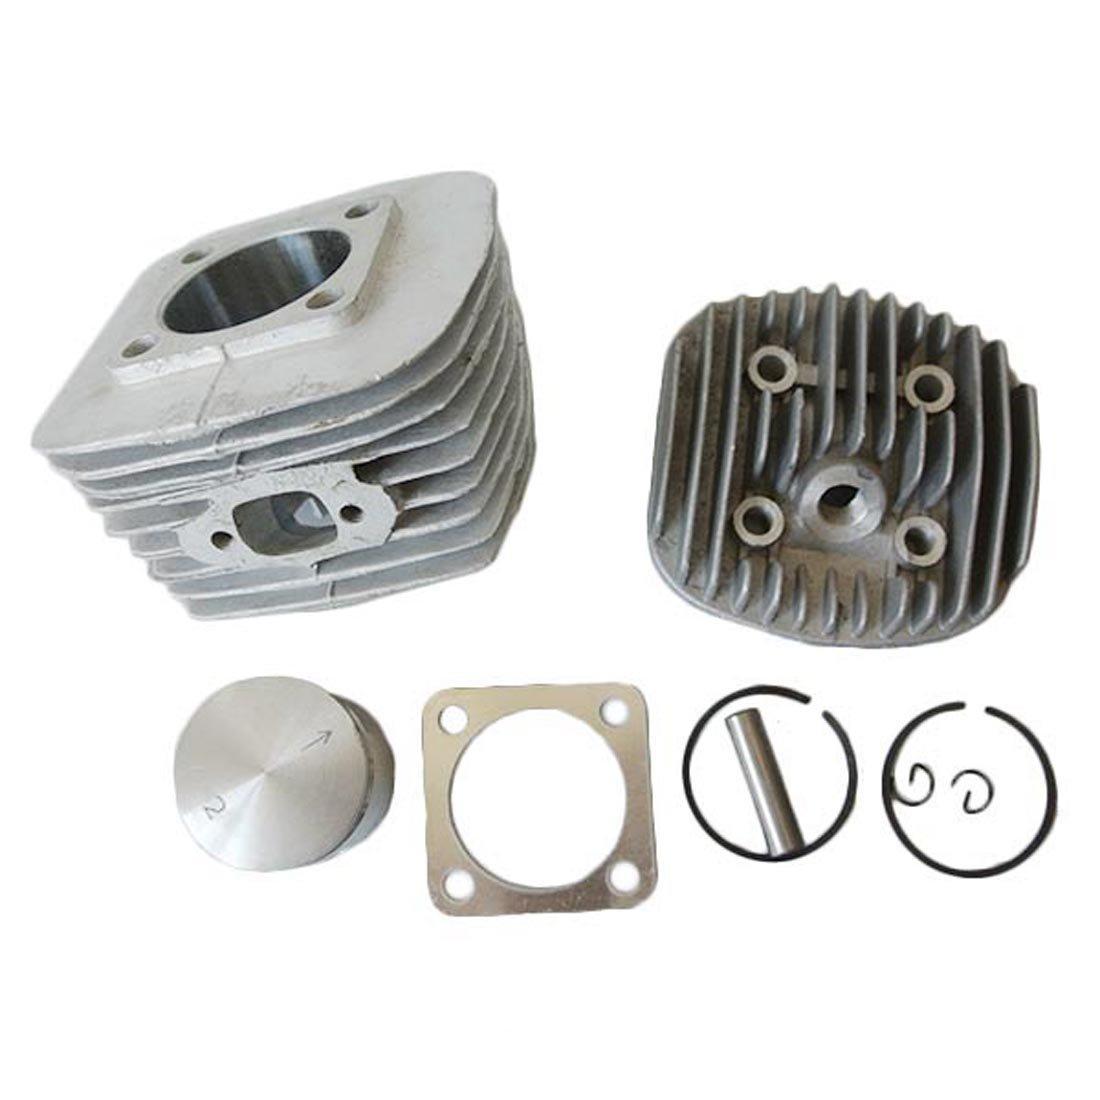 sthus Cylinder Kit& Piston &Piston Ring Fit 80cc 2 Stroke Engine Motorized Bicycle